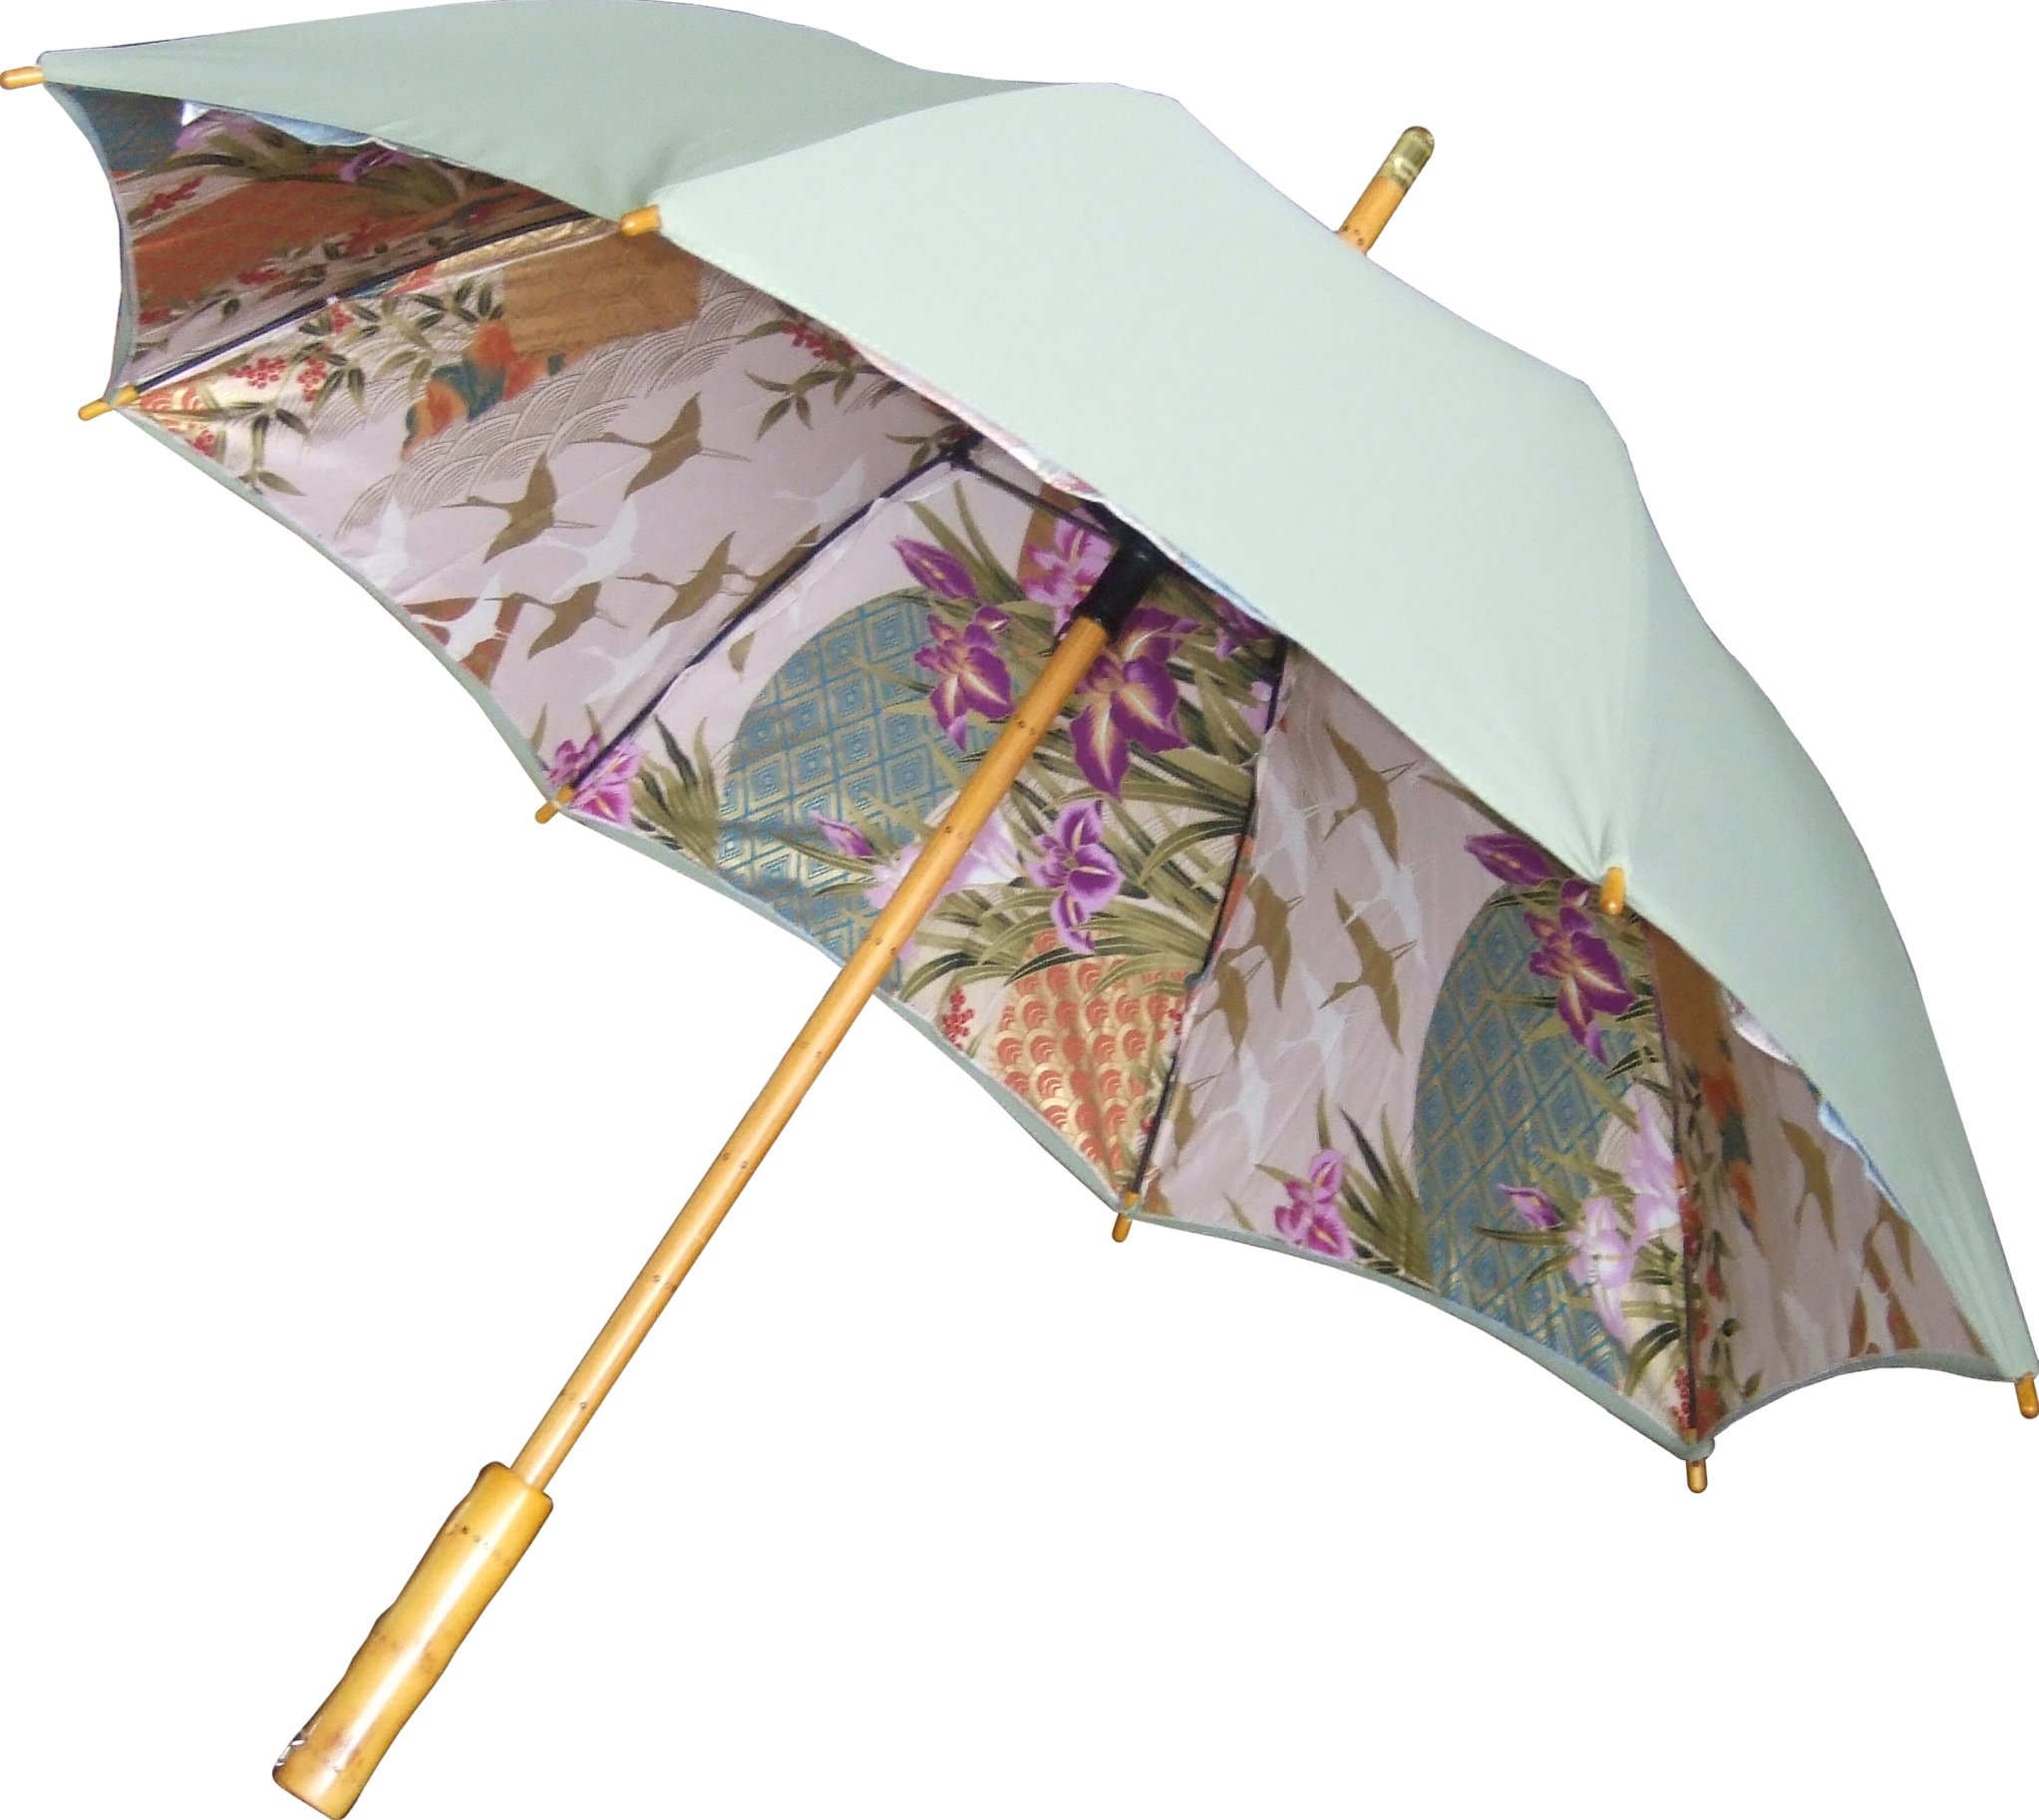 Umbrellas Hawaii Sun Protection UPF 50+ by Umbrellas Hawaii (Image #1)